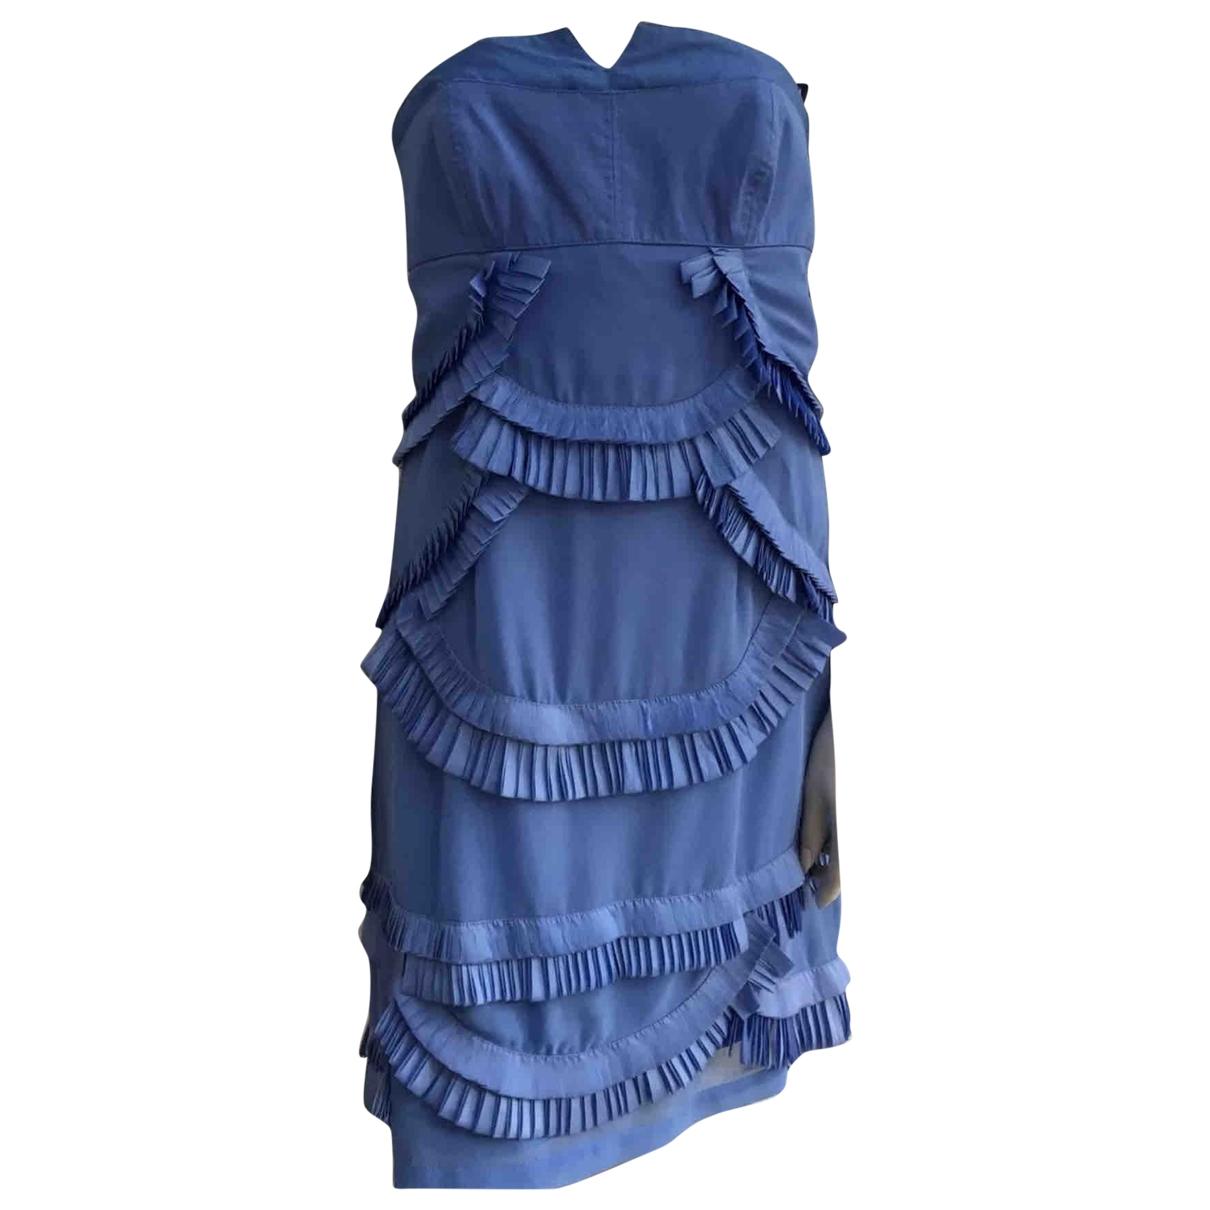 Reiss - Robe   pour femme - bleu